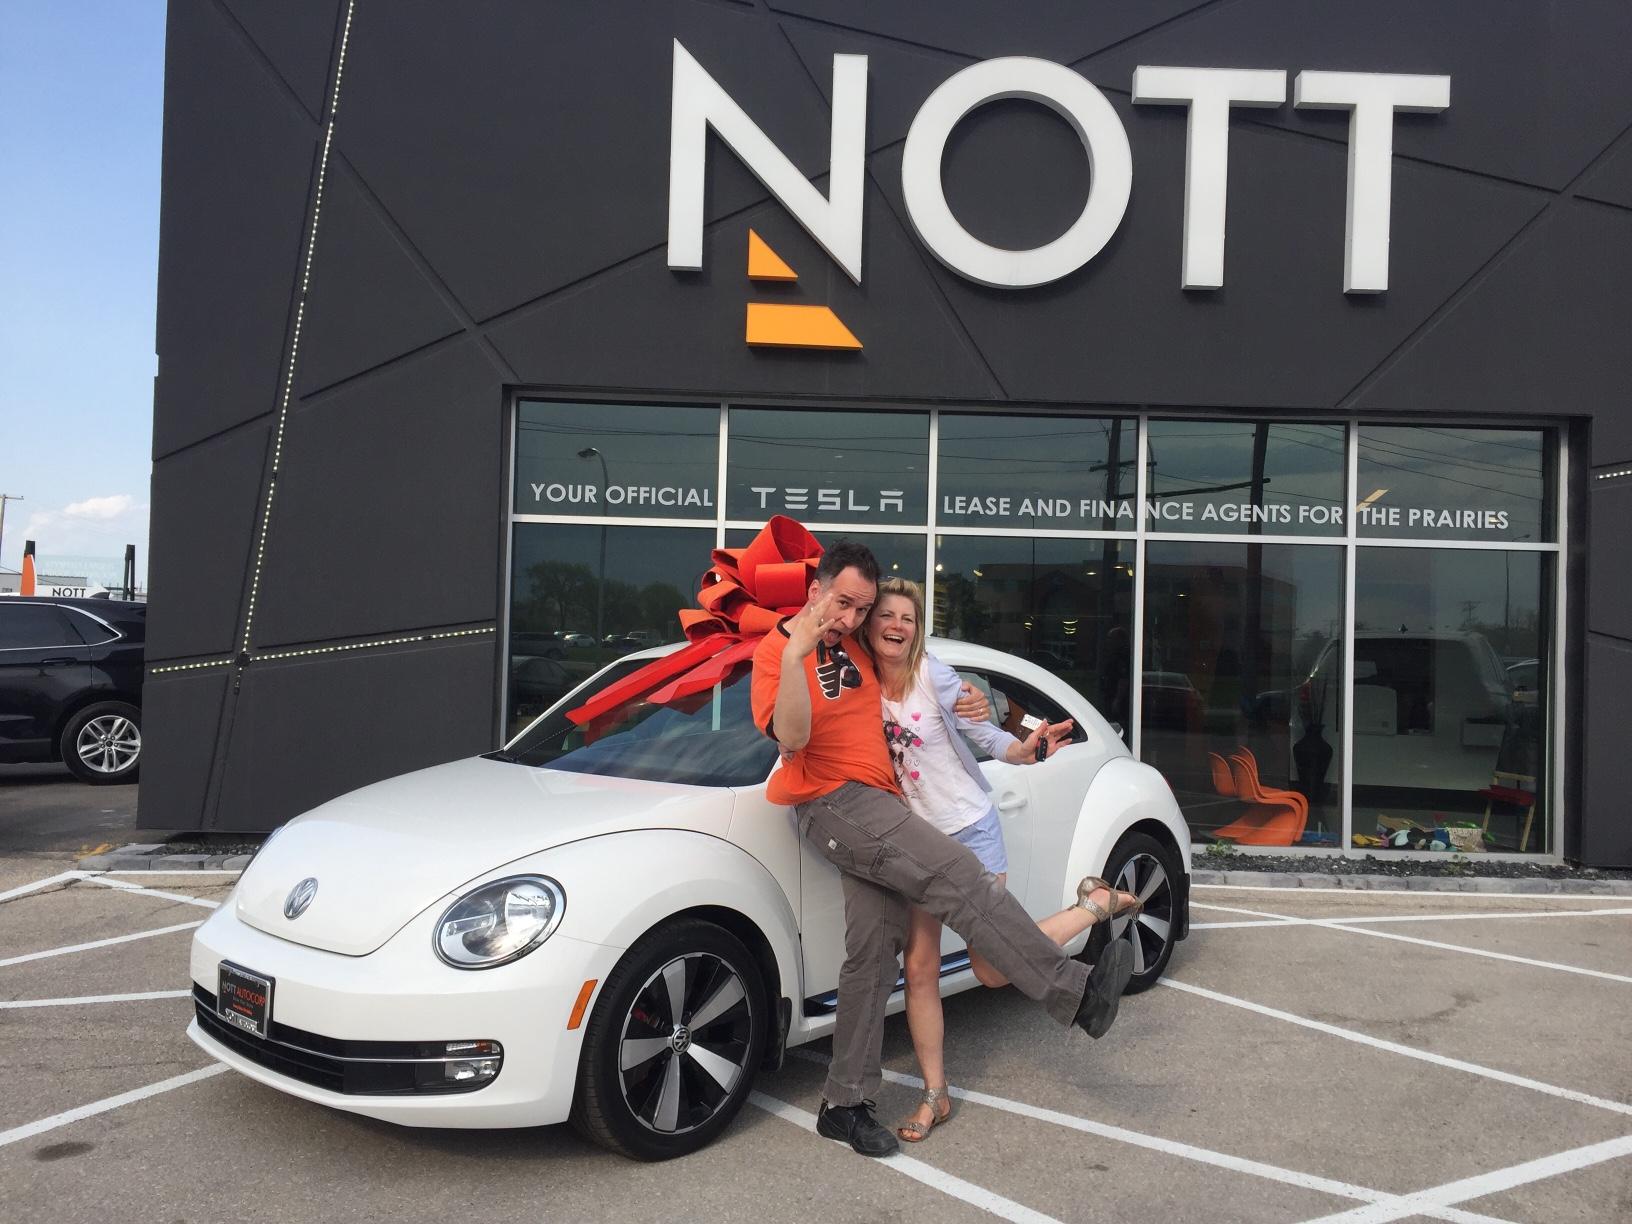 05-19-16_C4864_2012-Volkswagen-Beetle_Christine-Kurkowski